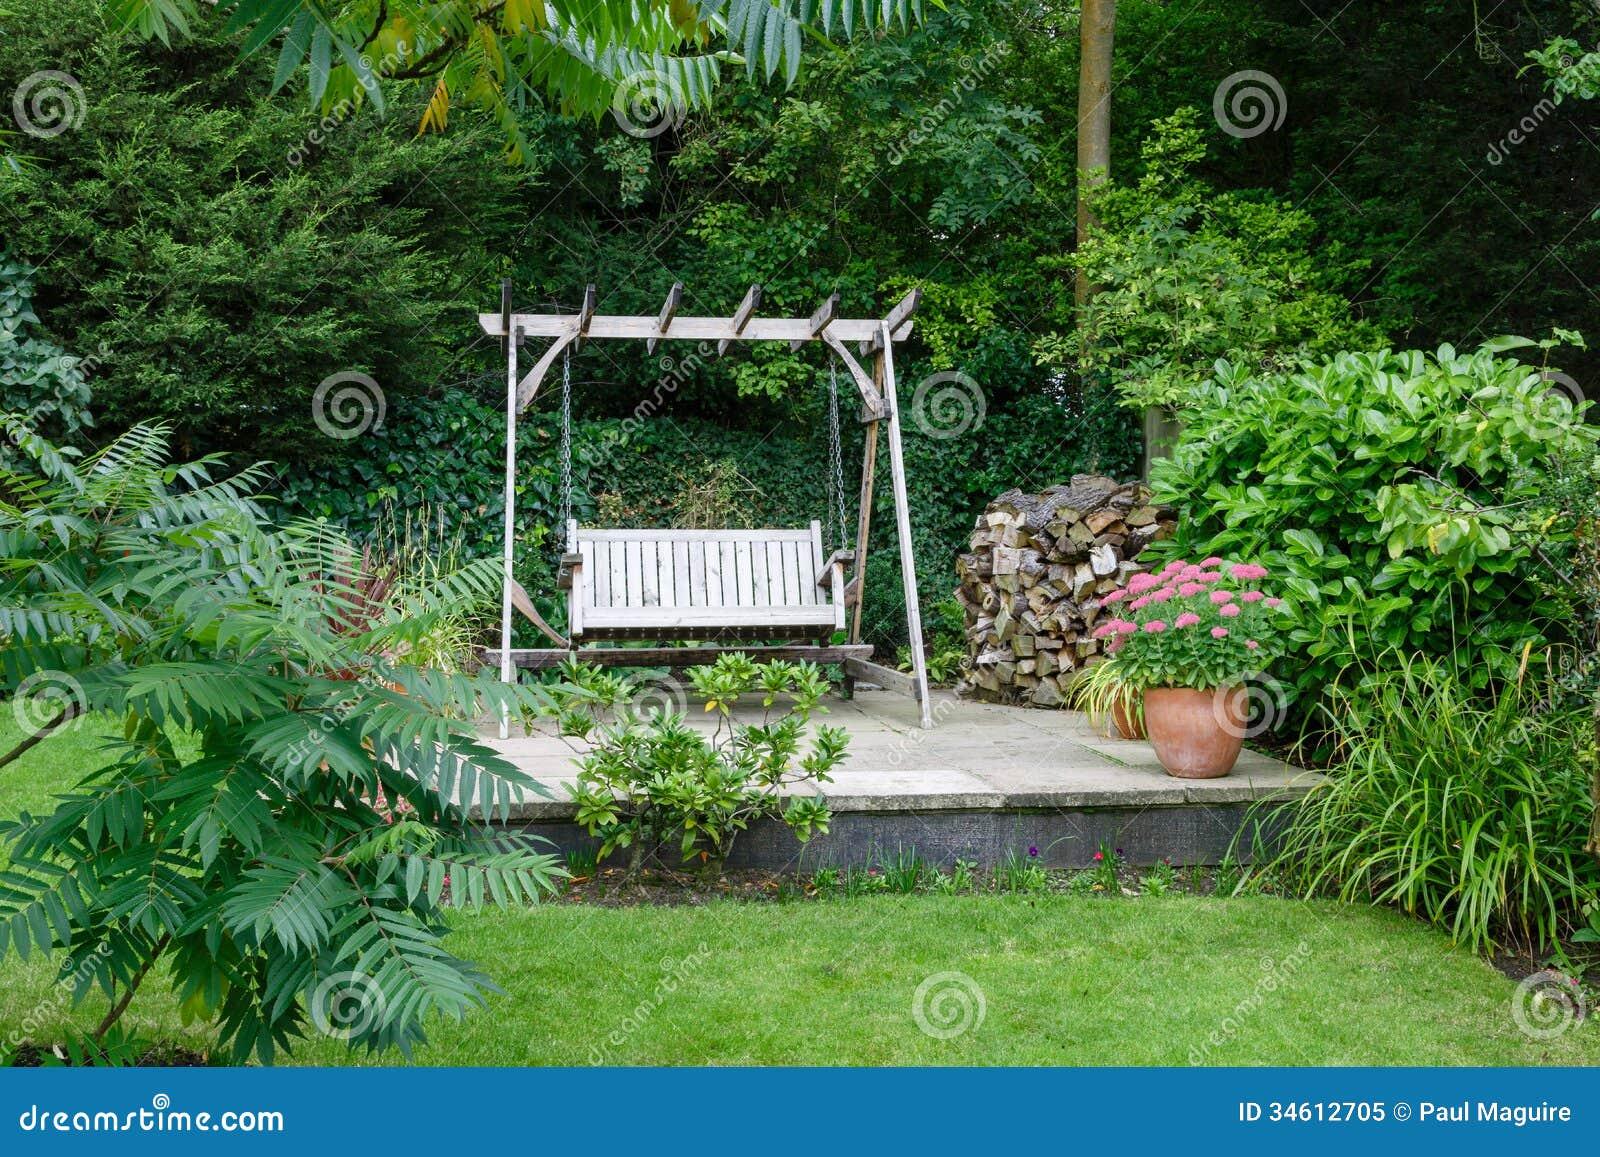 Garden Patio Royalty Free Stock Photo - Image: 34612705